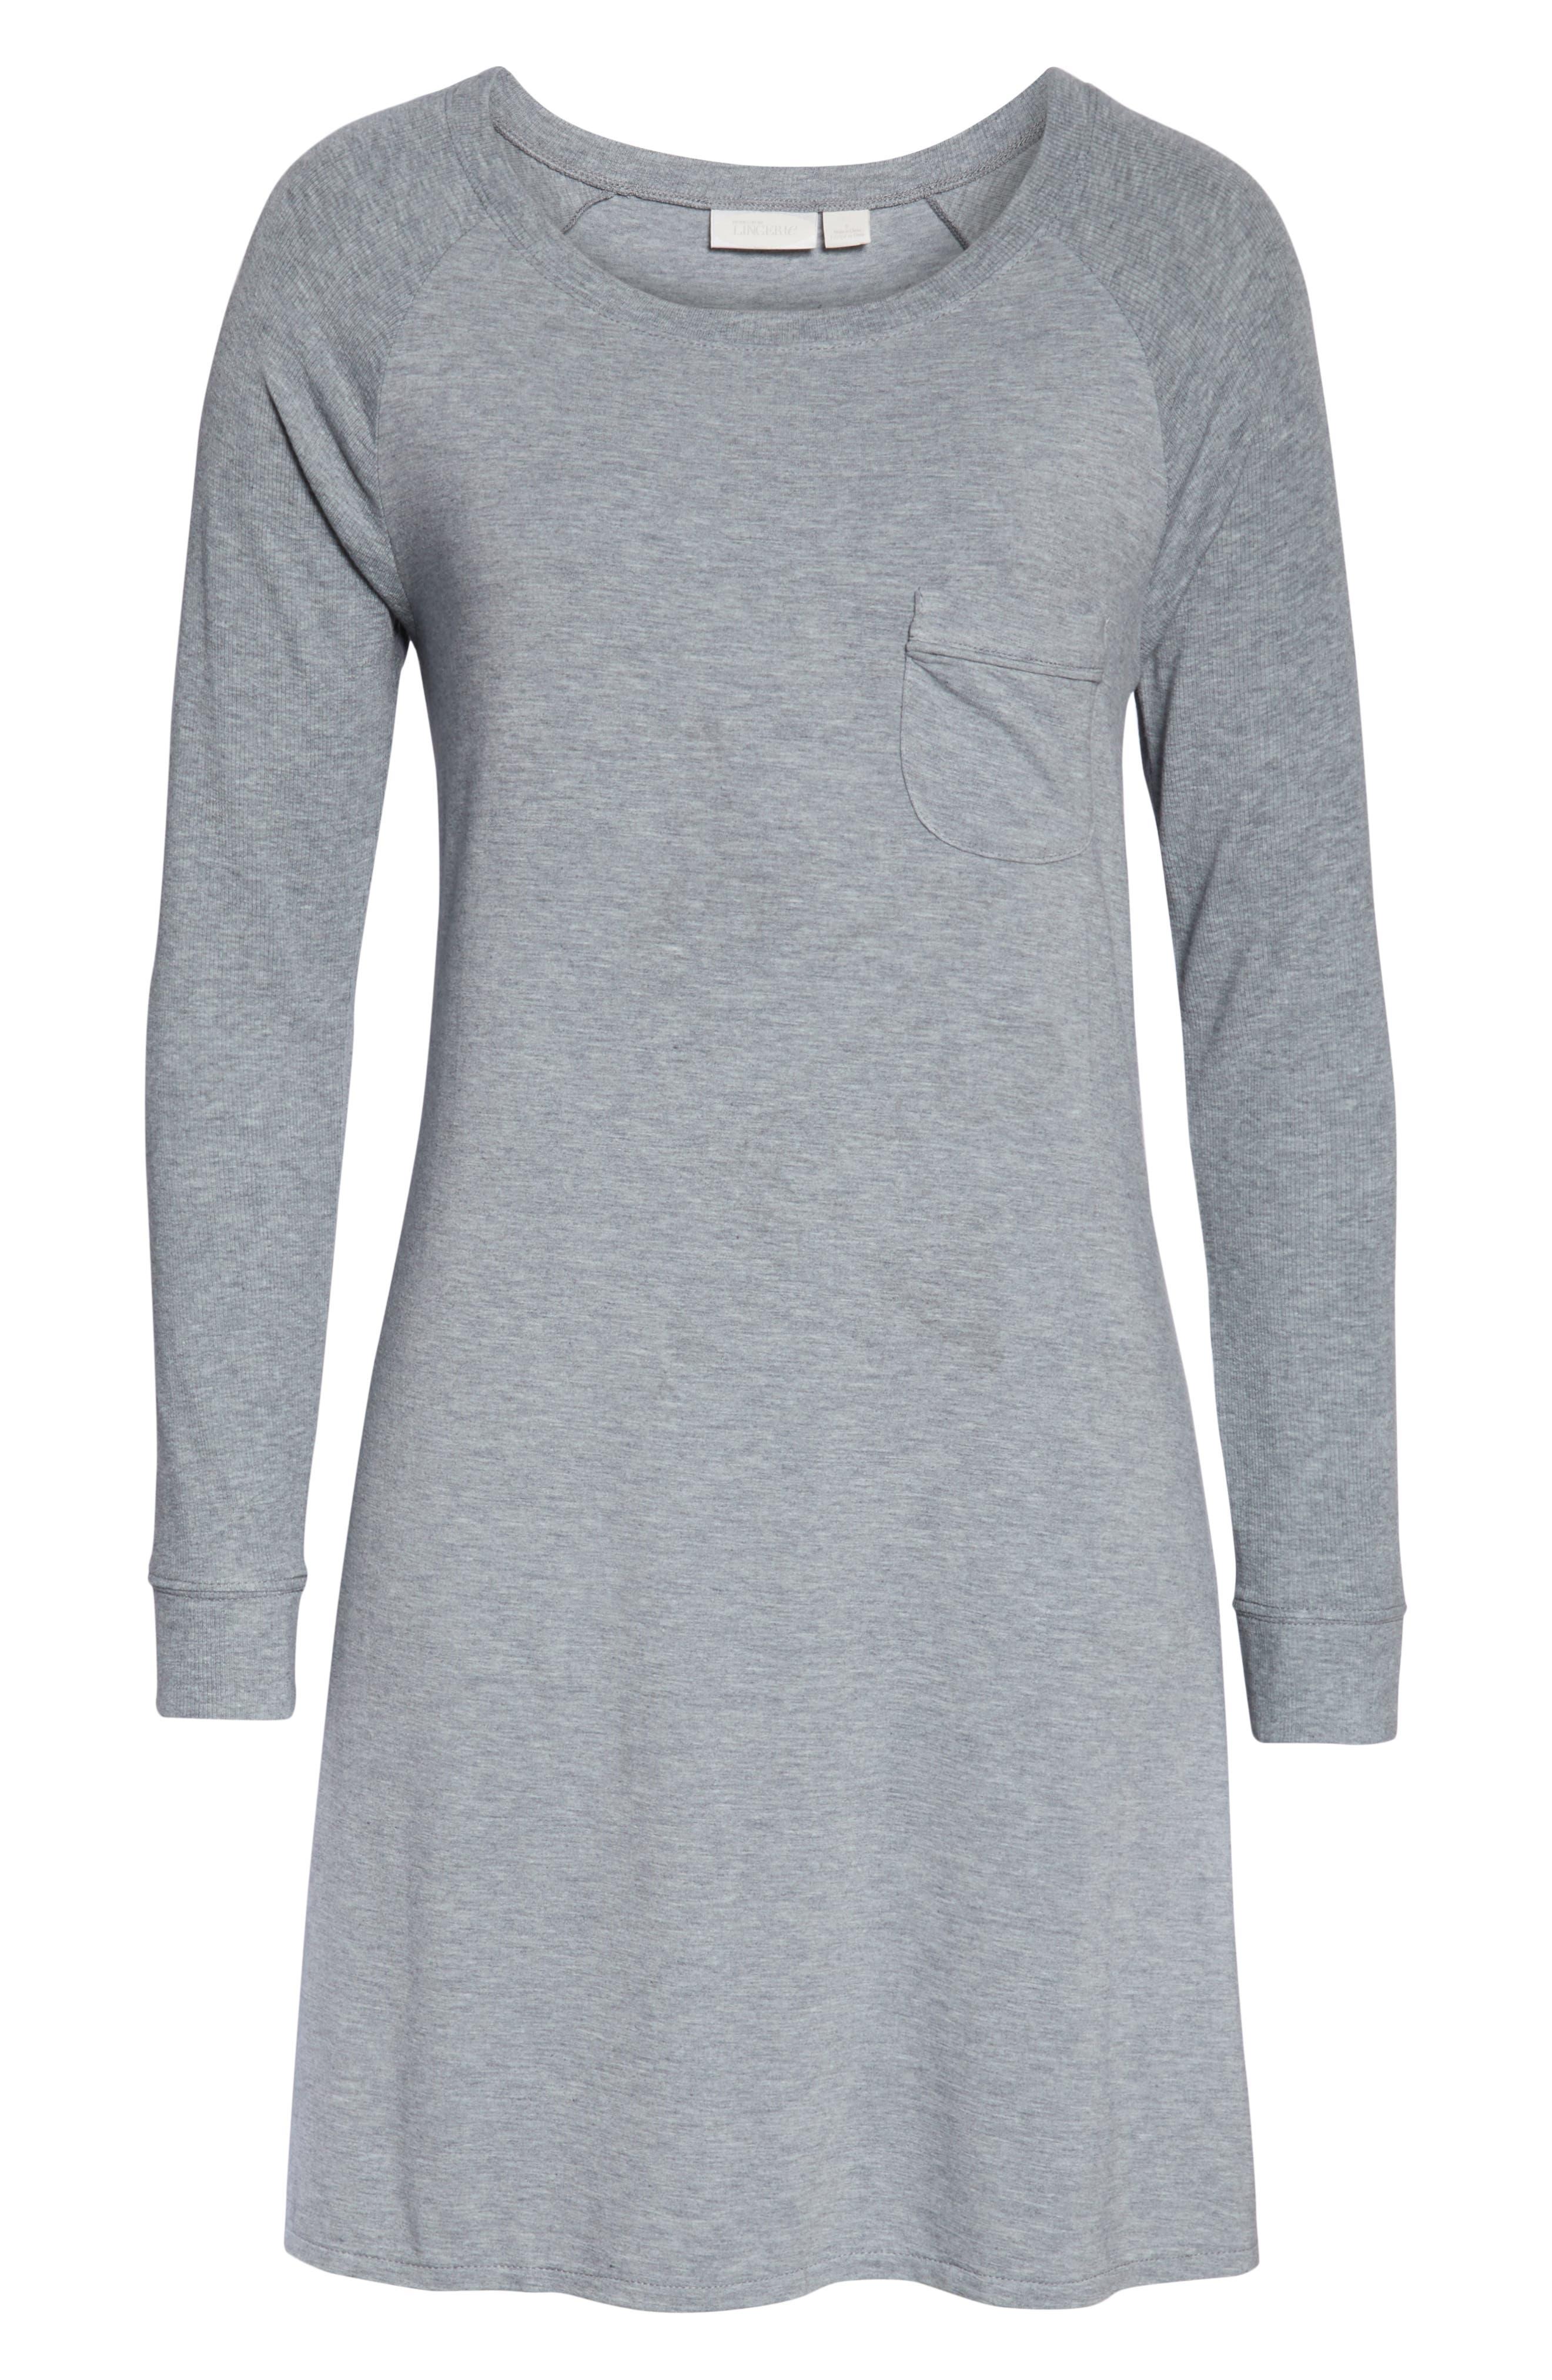 Breathe Sleep Shirt,                             Alternate thumbnail 6, color,                             GREY STEEL HEATHER